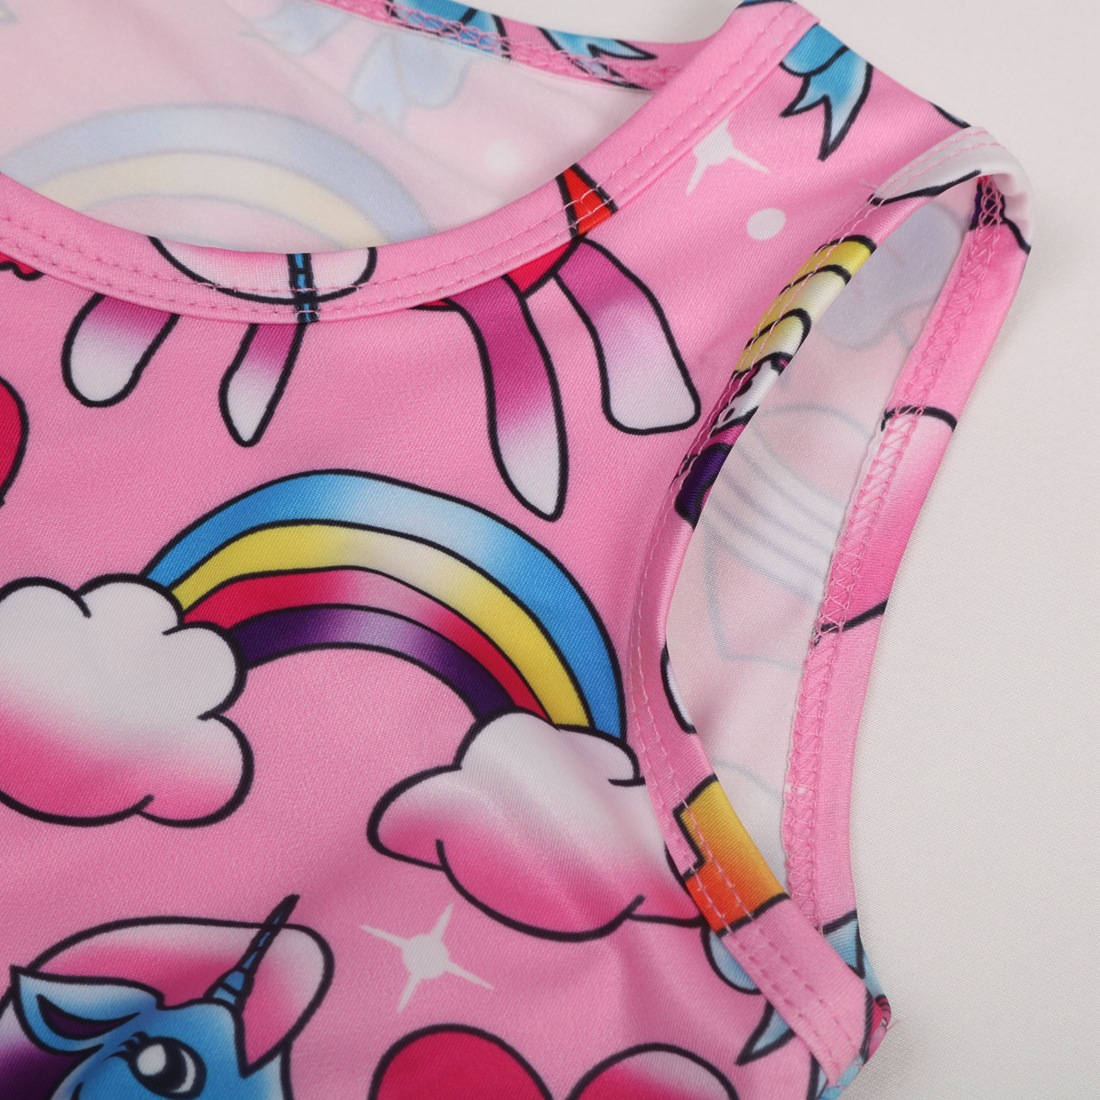 Children Clothing Vestidos My little Baby Flamingo Unicorn Party Girl Dress Kids Summer Dresses for Girls Clothes Princess Dress 4